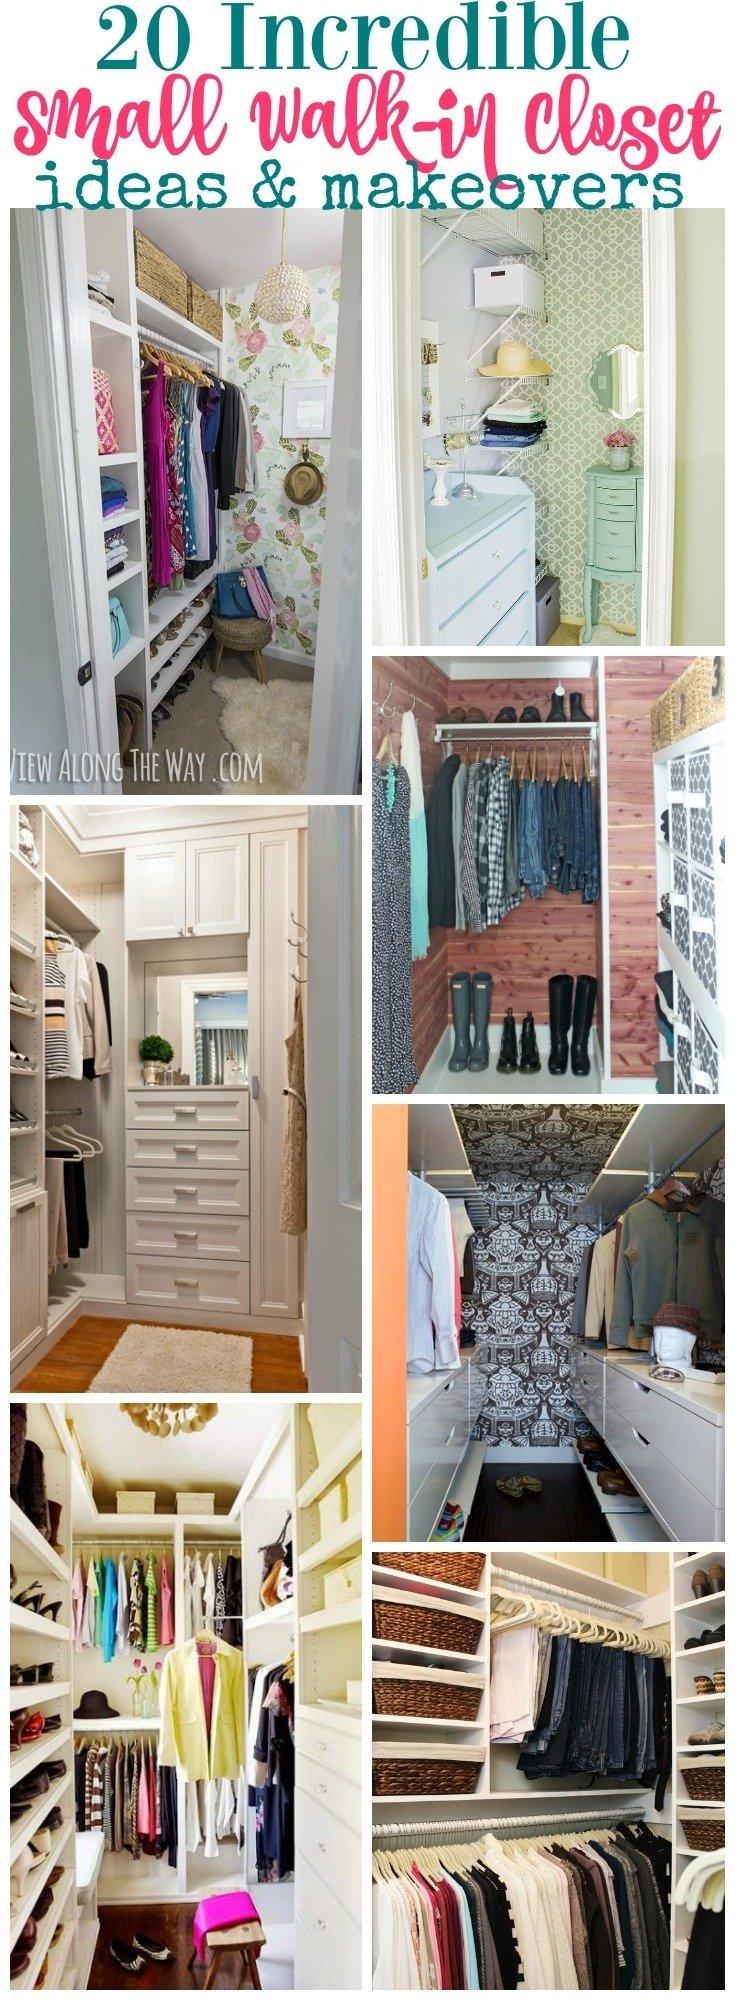 10 Stylish Small Walk In Closet Ideas 20 incredible small walk in closet ideas makeovers the happy housie 5 2021